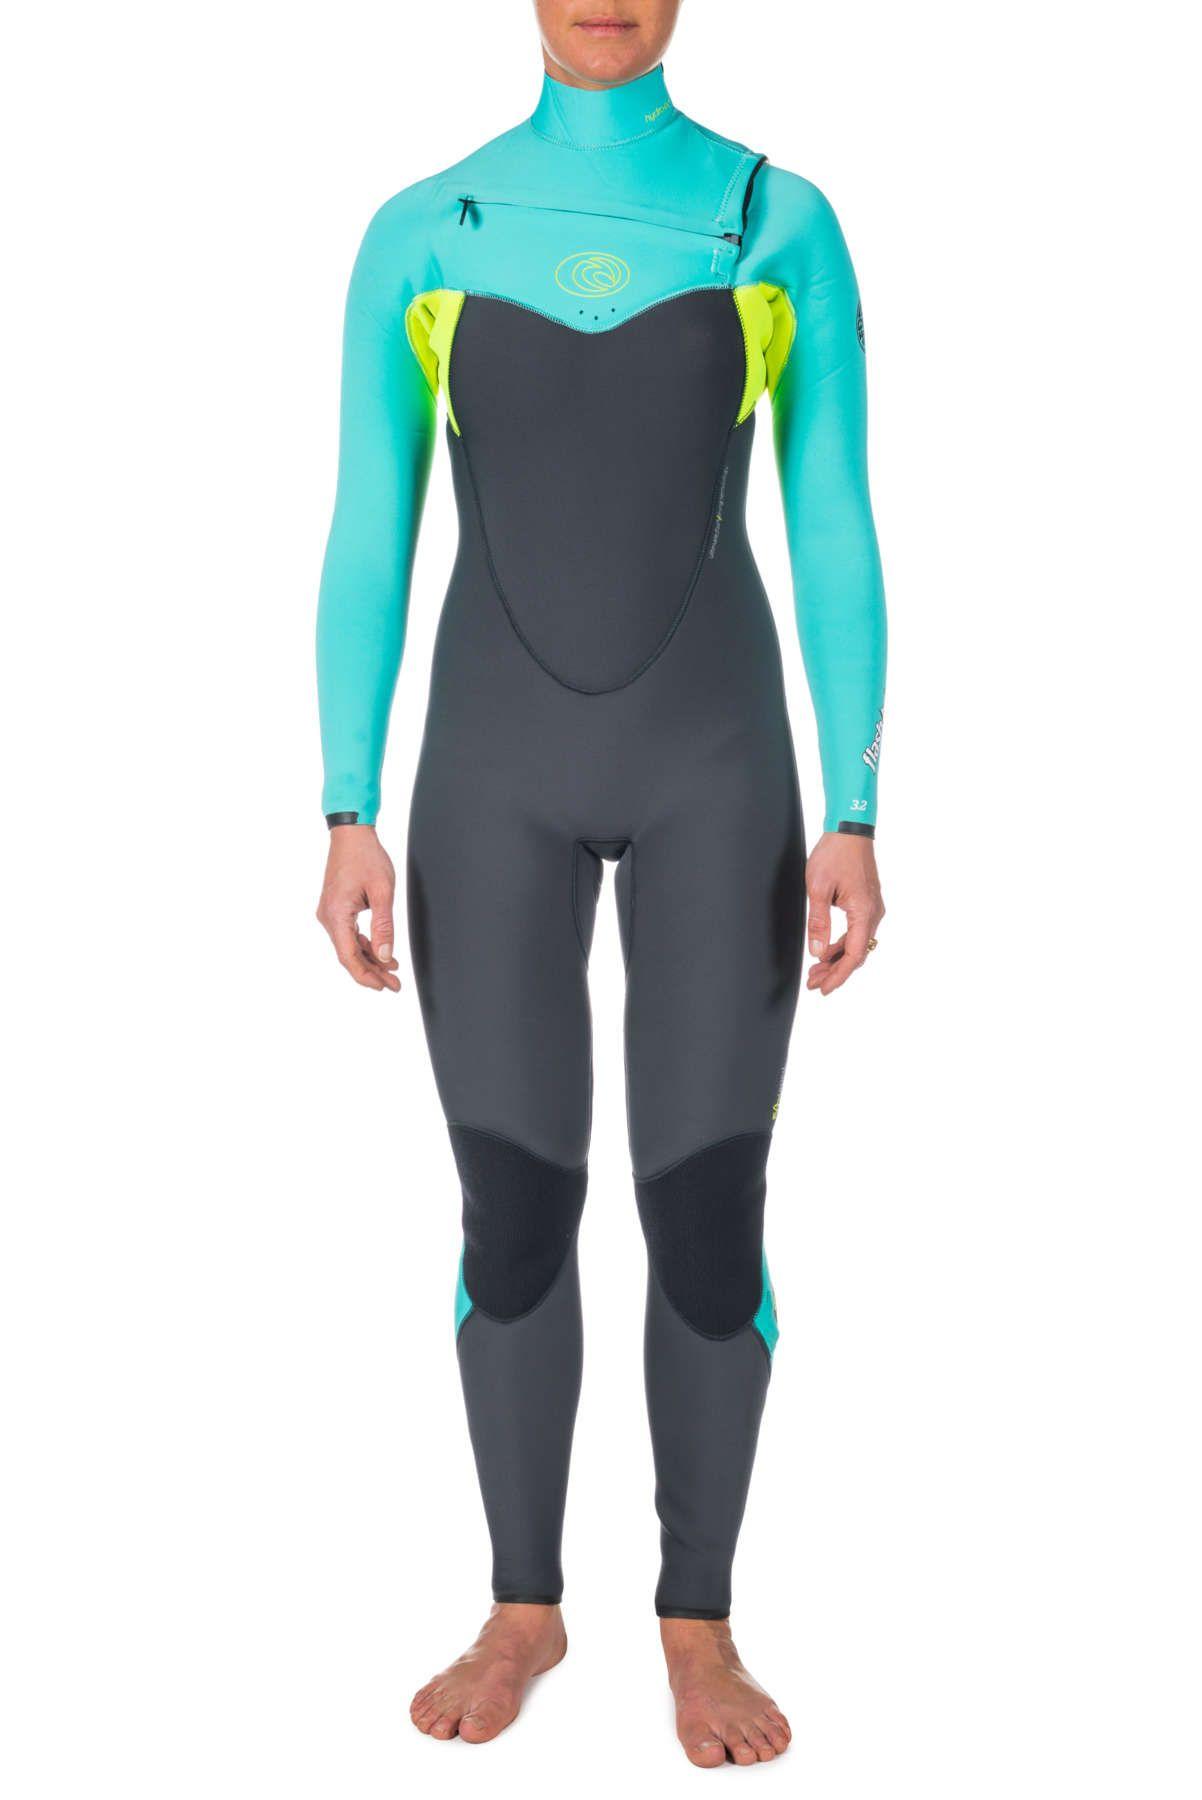 668676ecf0 Rip Curl Flashbomb 3/2 GBS Chest Zip Women's Wetsuit | Wetsuits ...